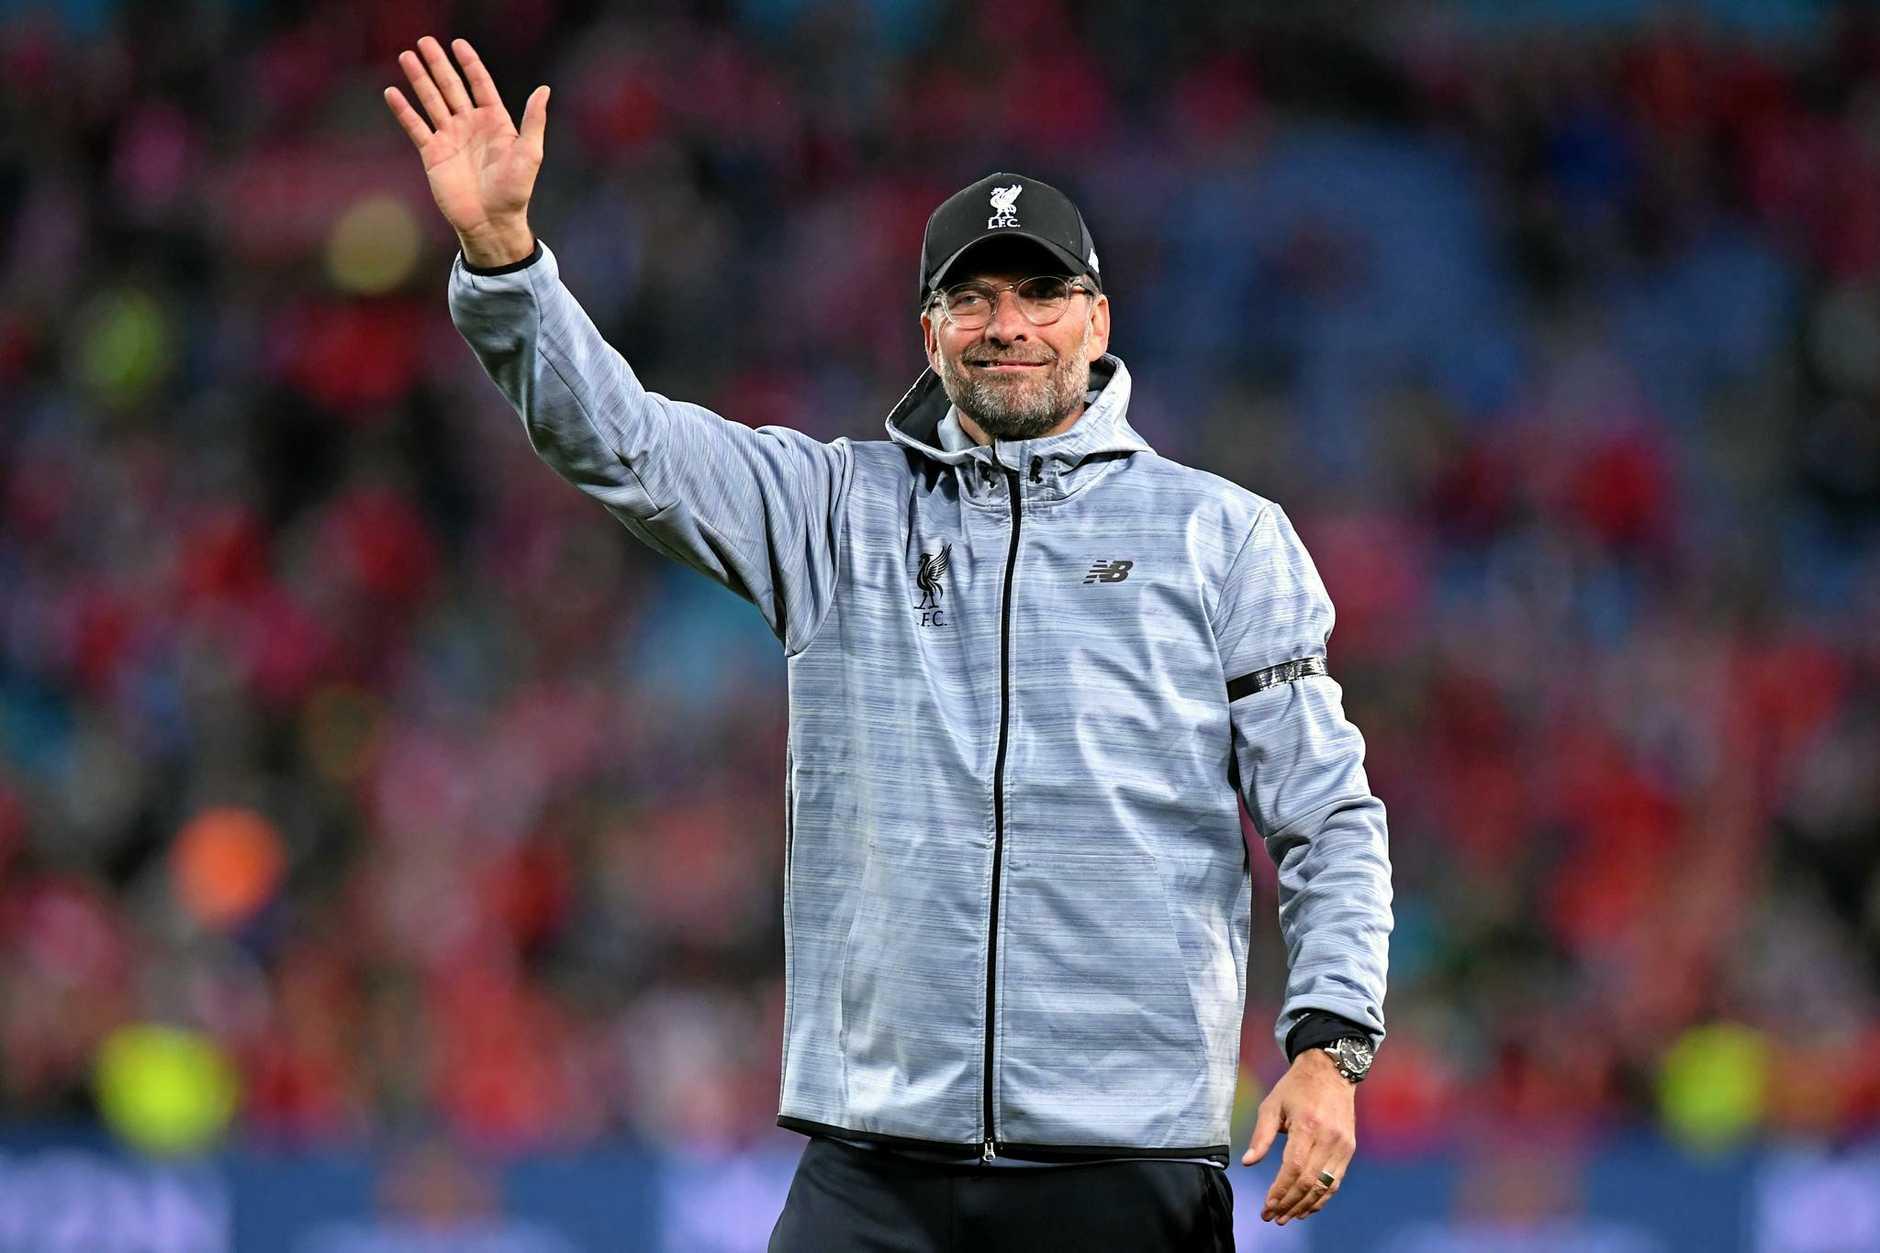 Liverpool coach Jurgen Klopp waves to the crowd.